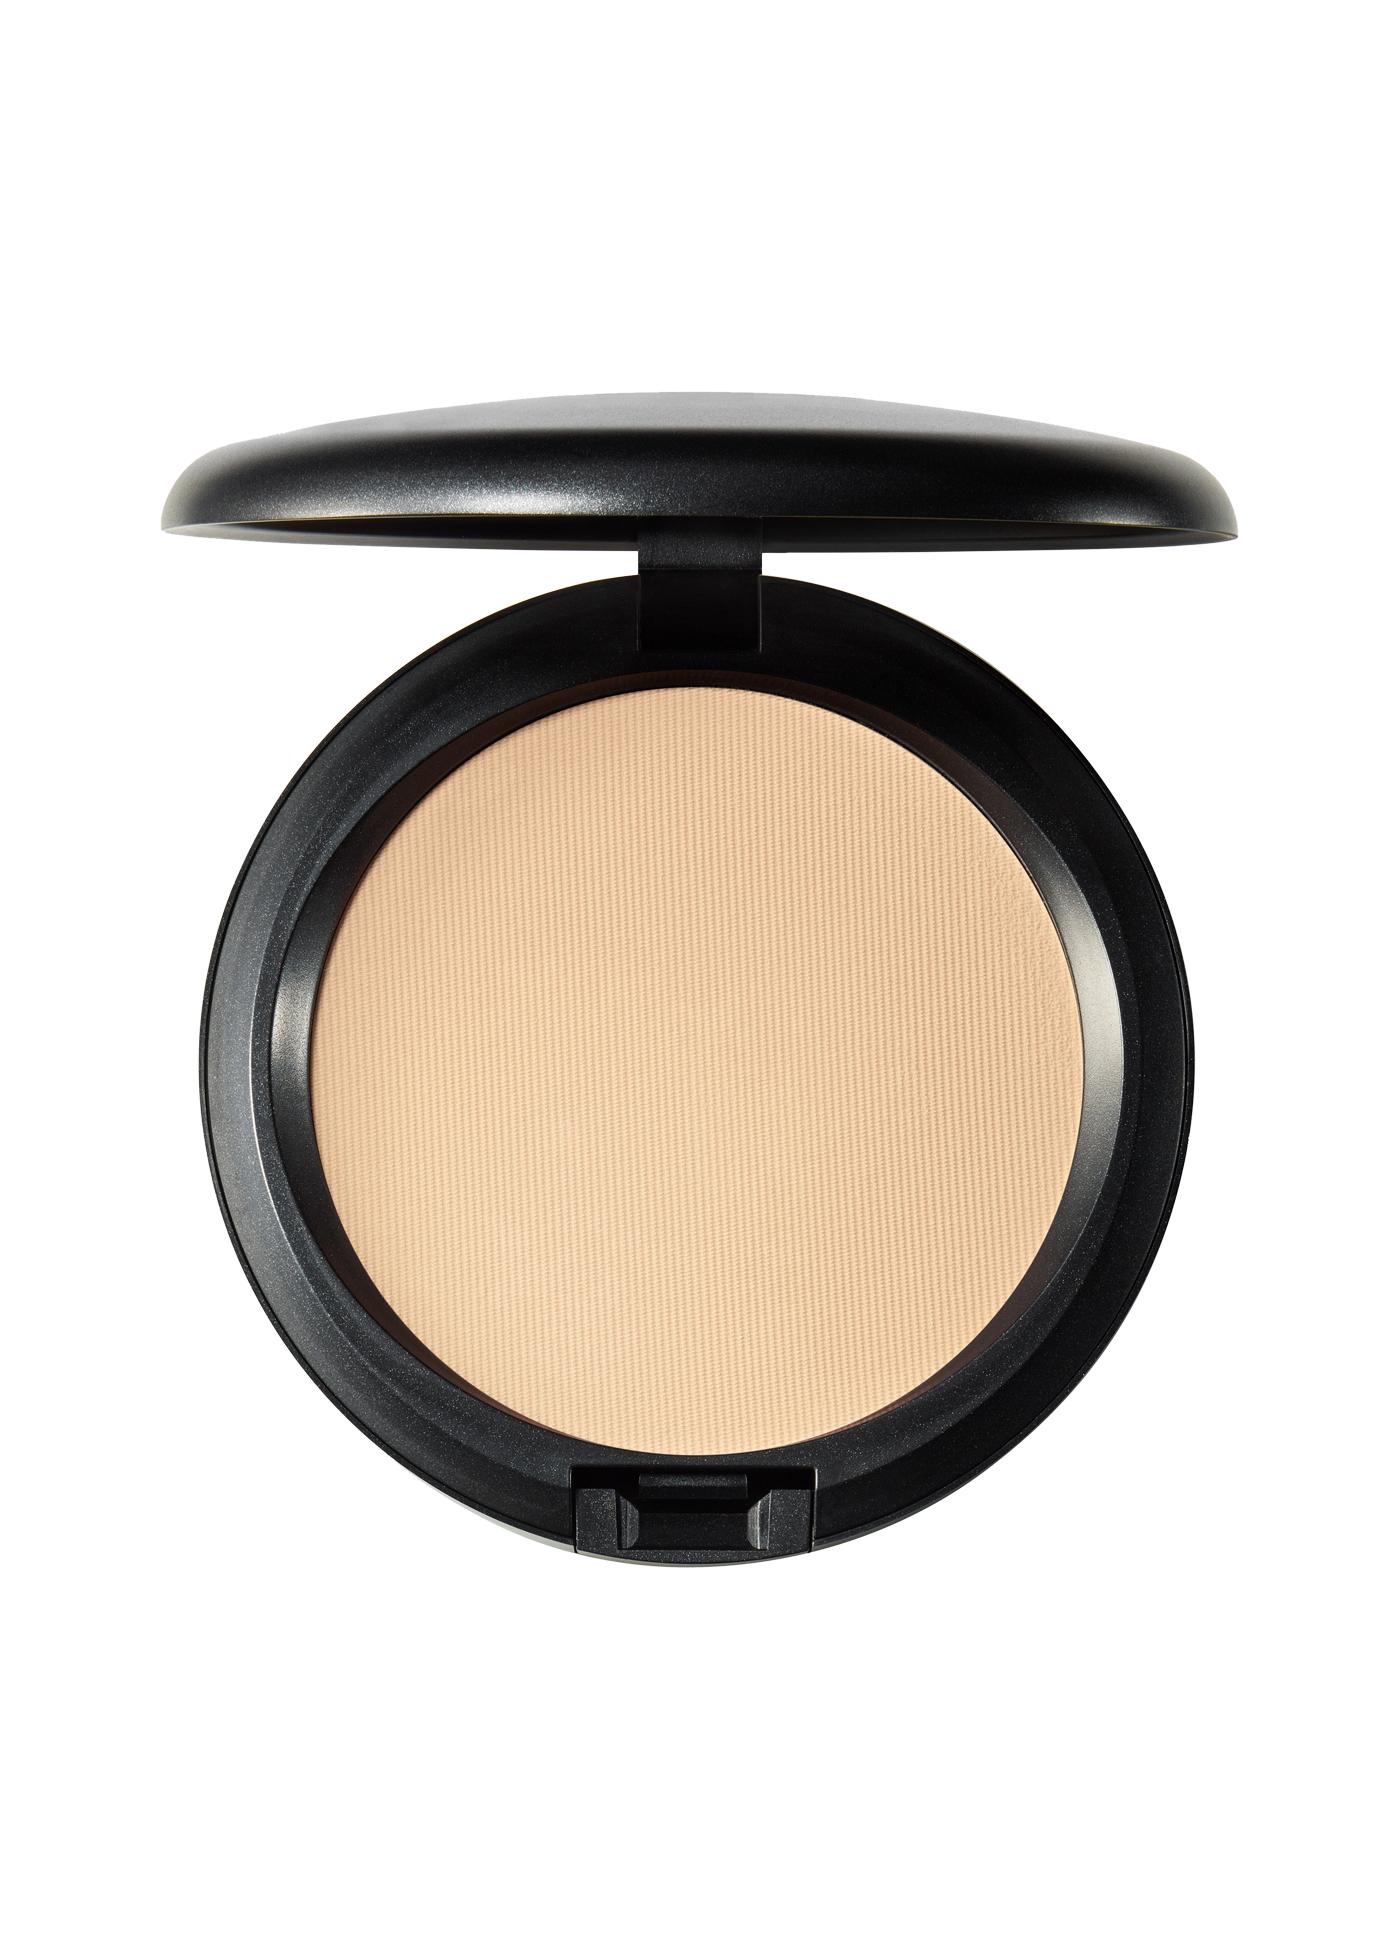 MAC, BLOT POWDER PRESSED 12 G image number 0